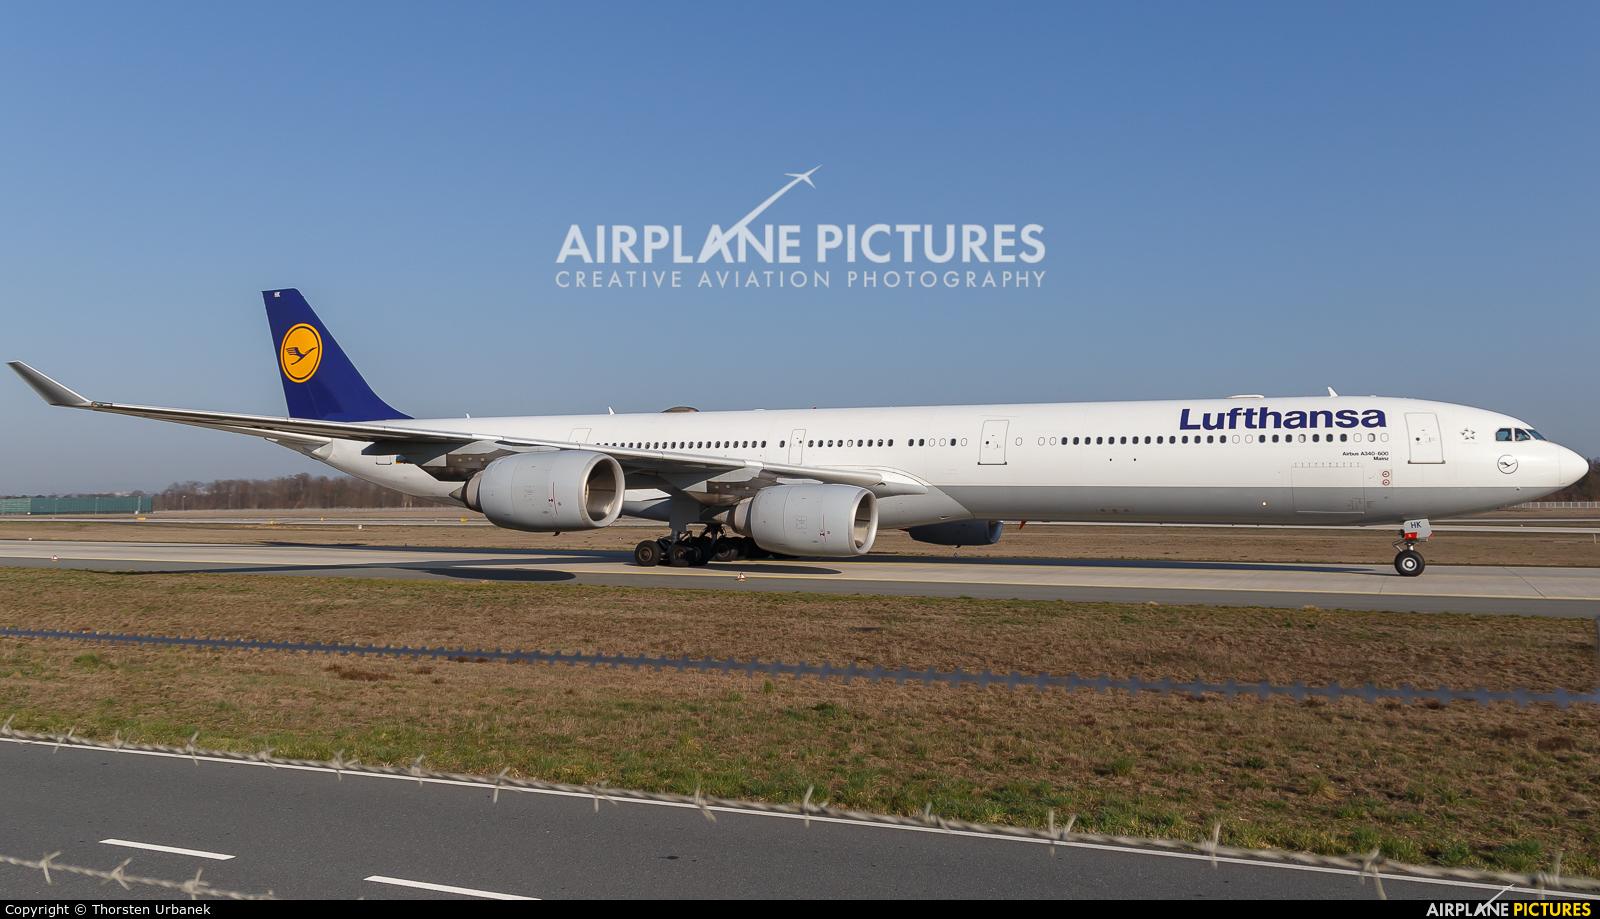 Lufthansa D-AIHK aircraft at Frankfurt